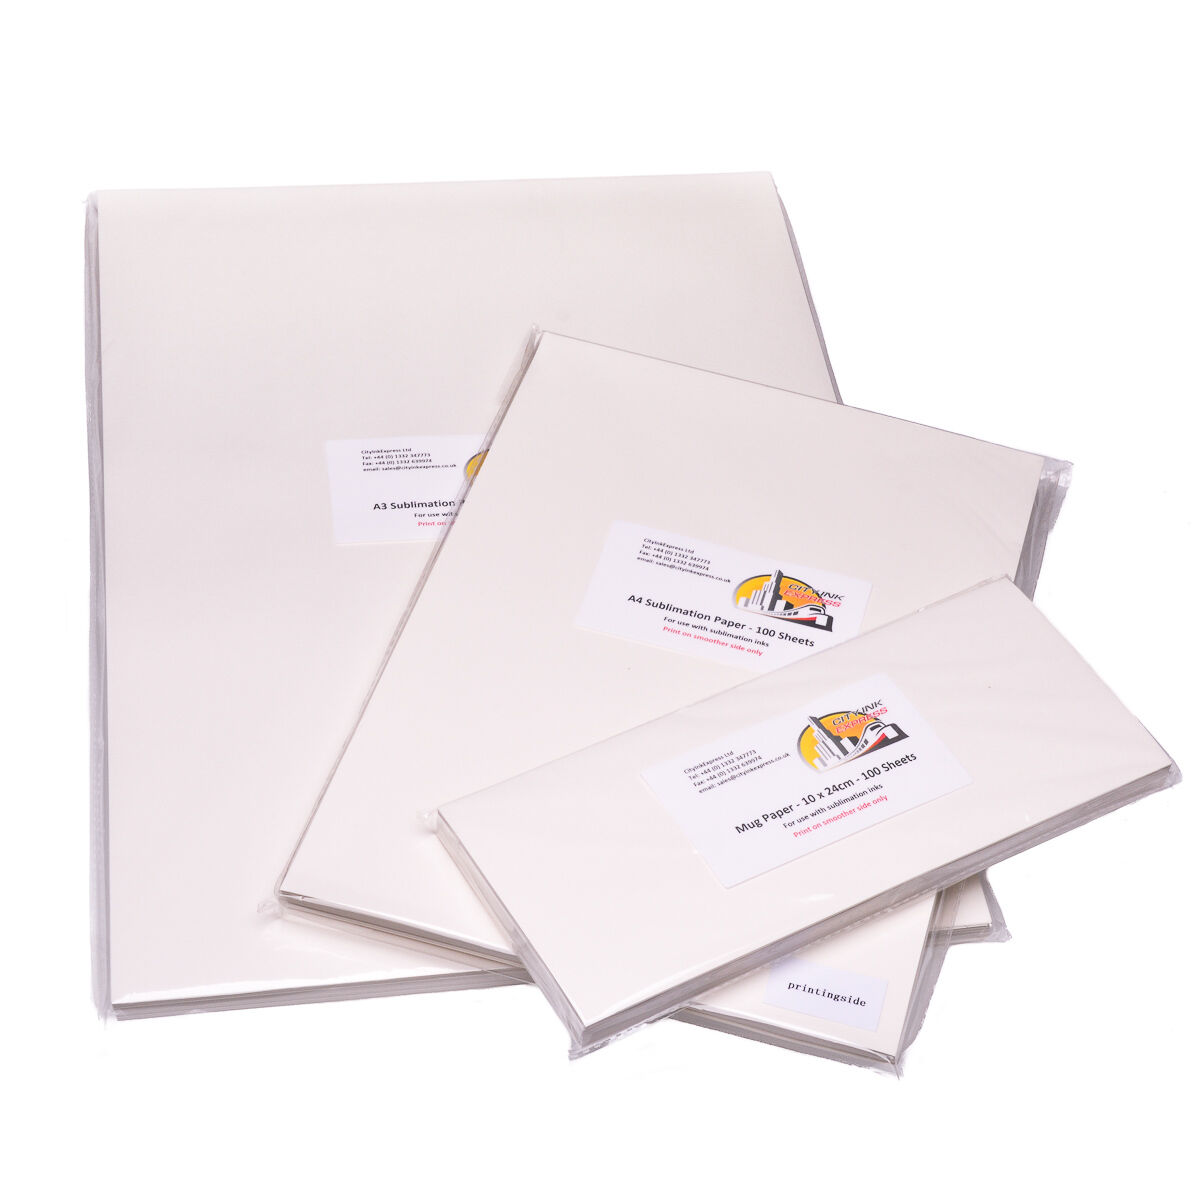 Dye Sublimation Paper for Epson L550 printer